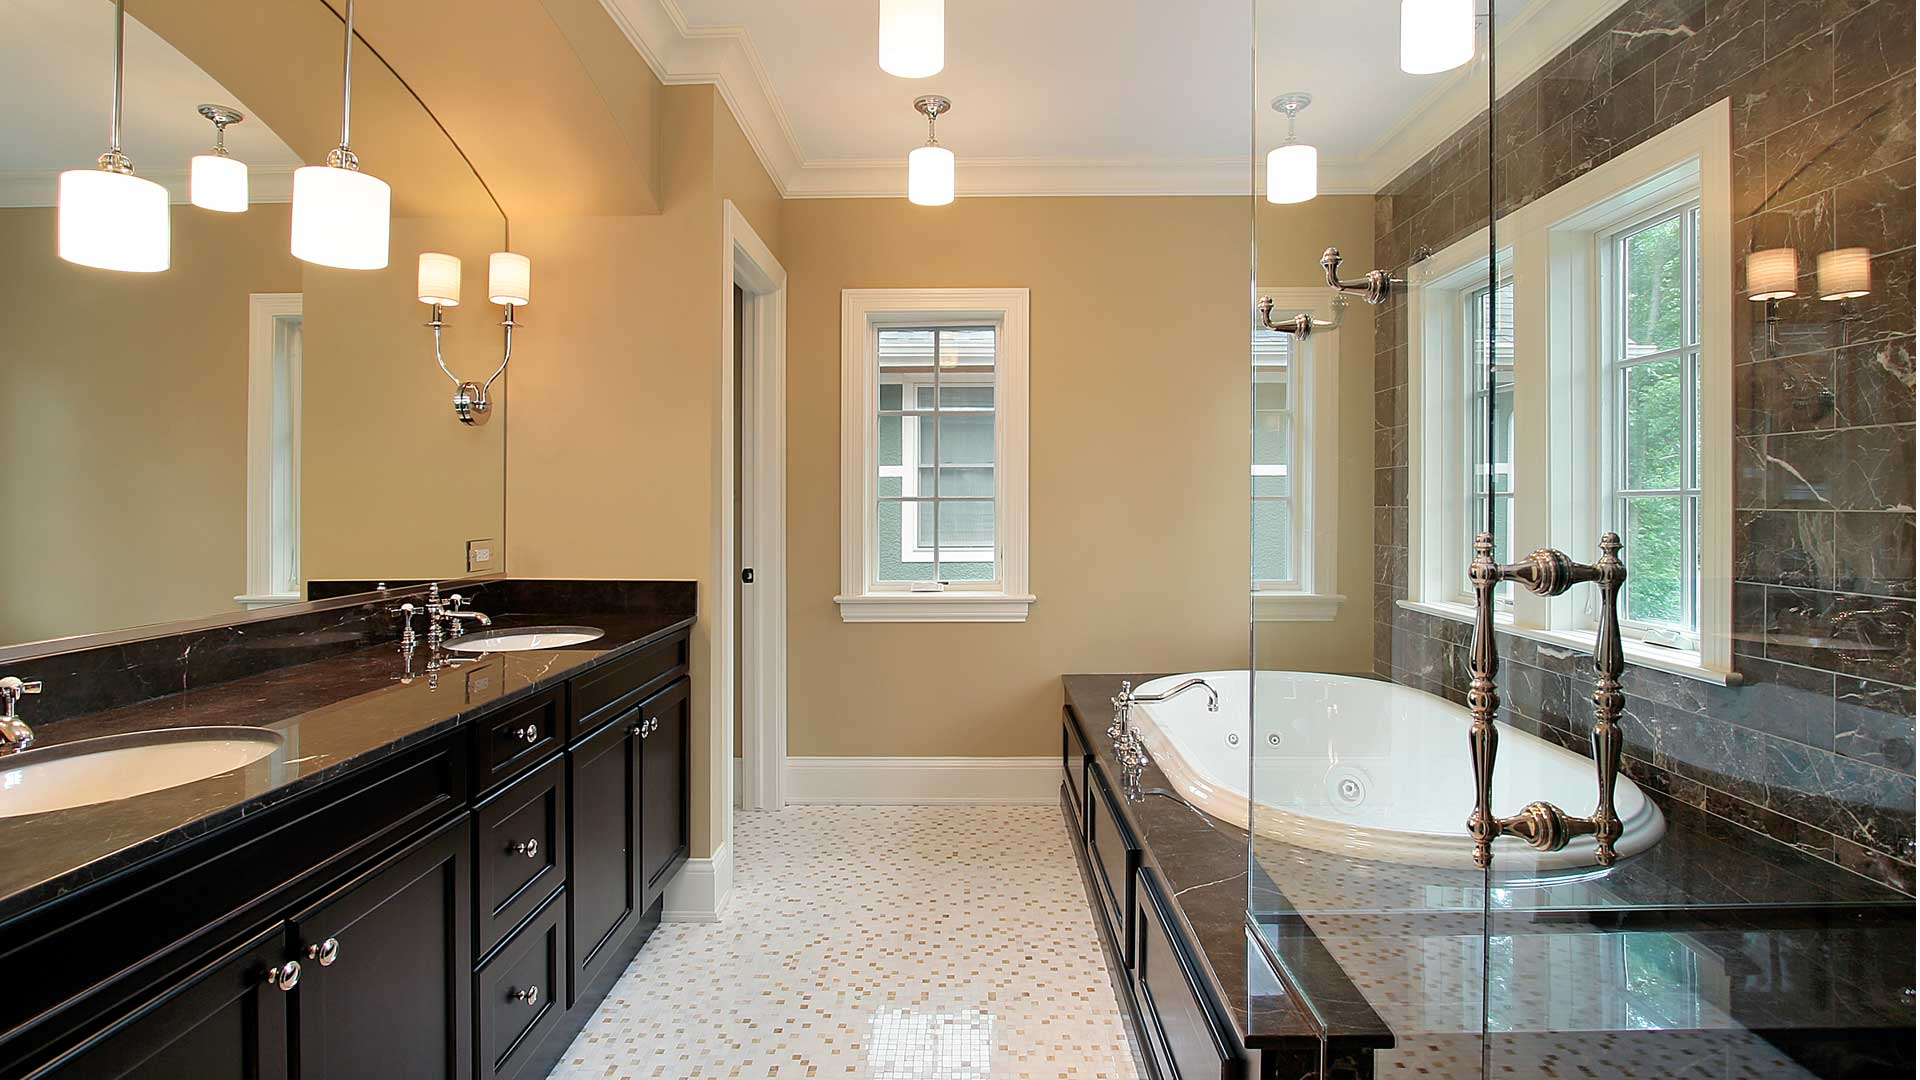 Atlanta Home Remodeling Company